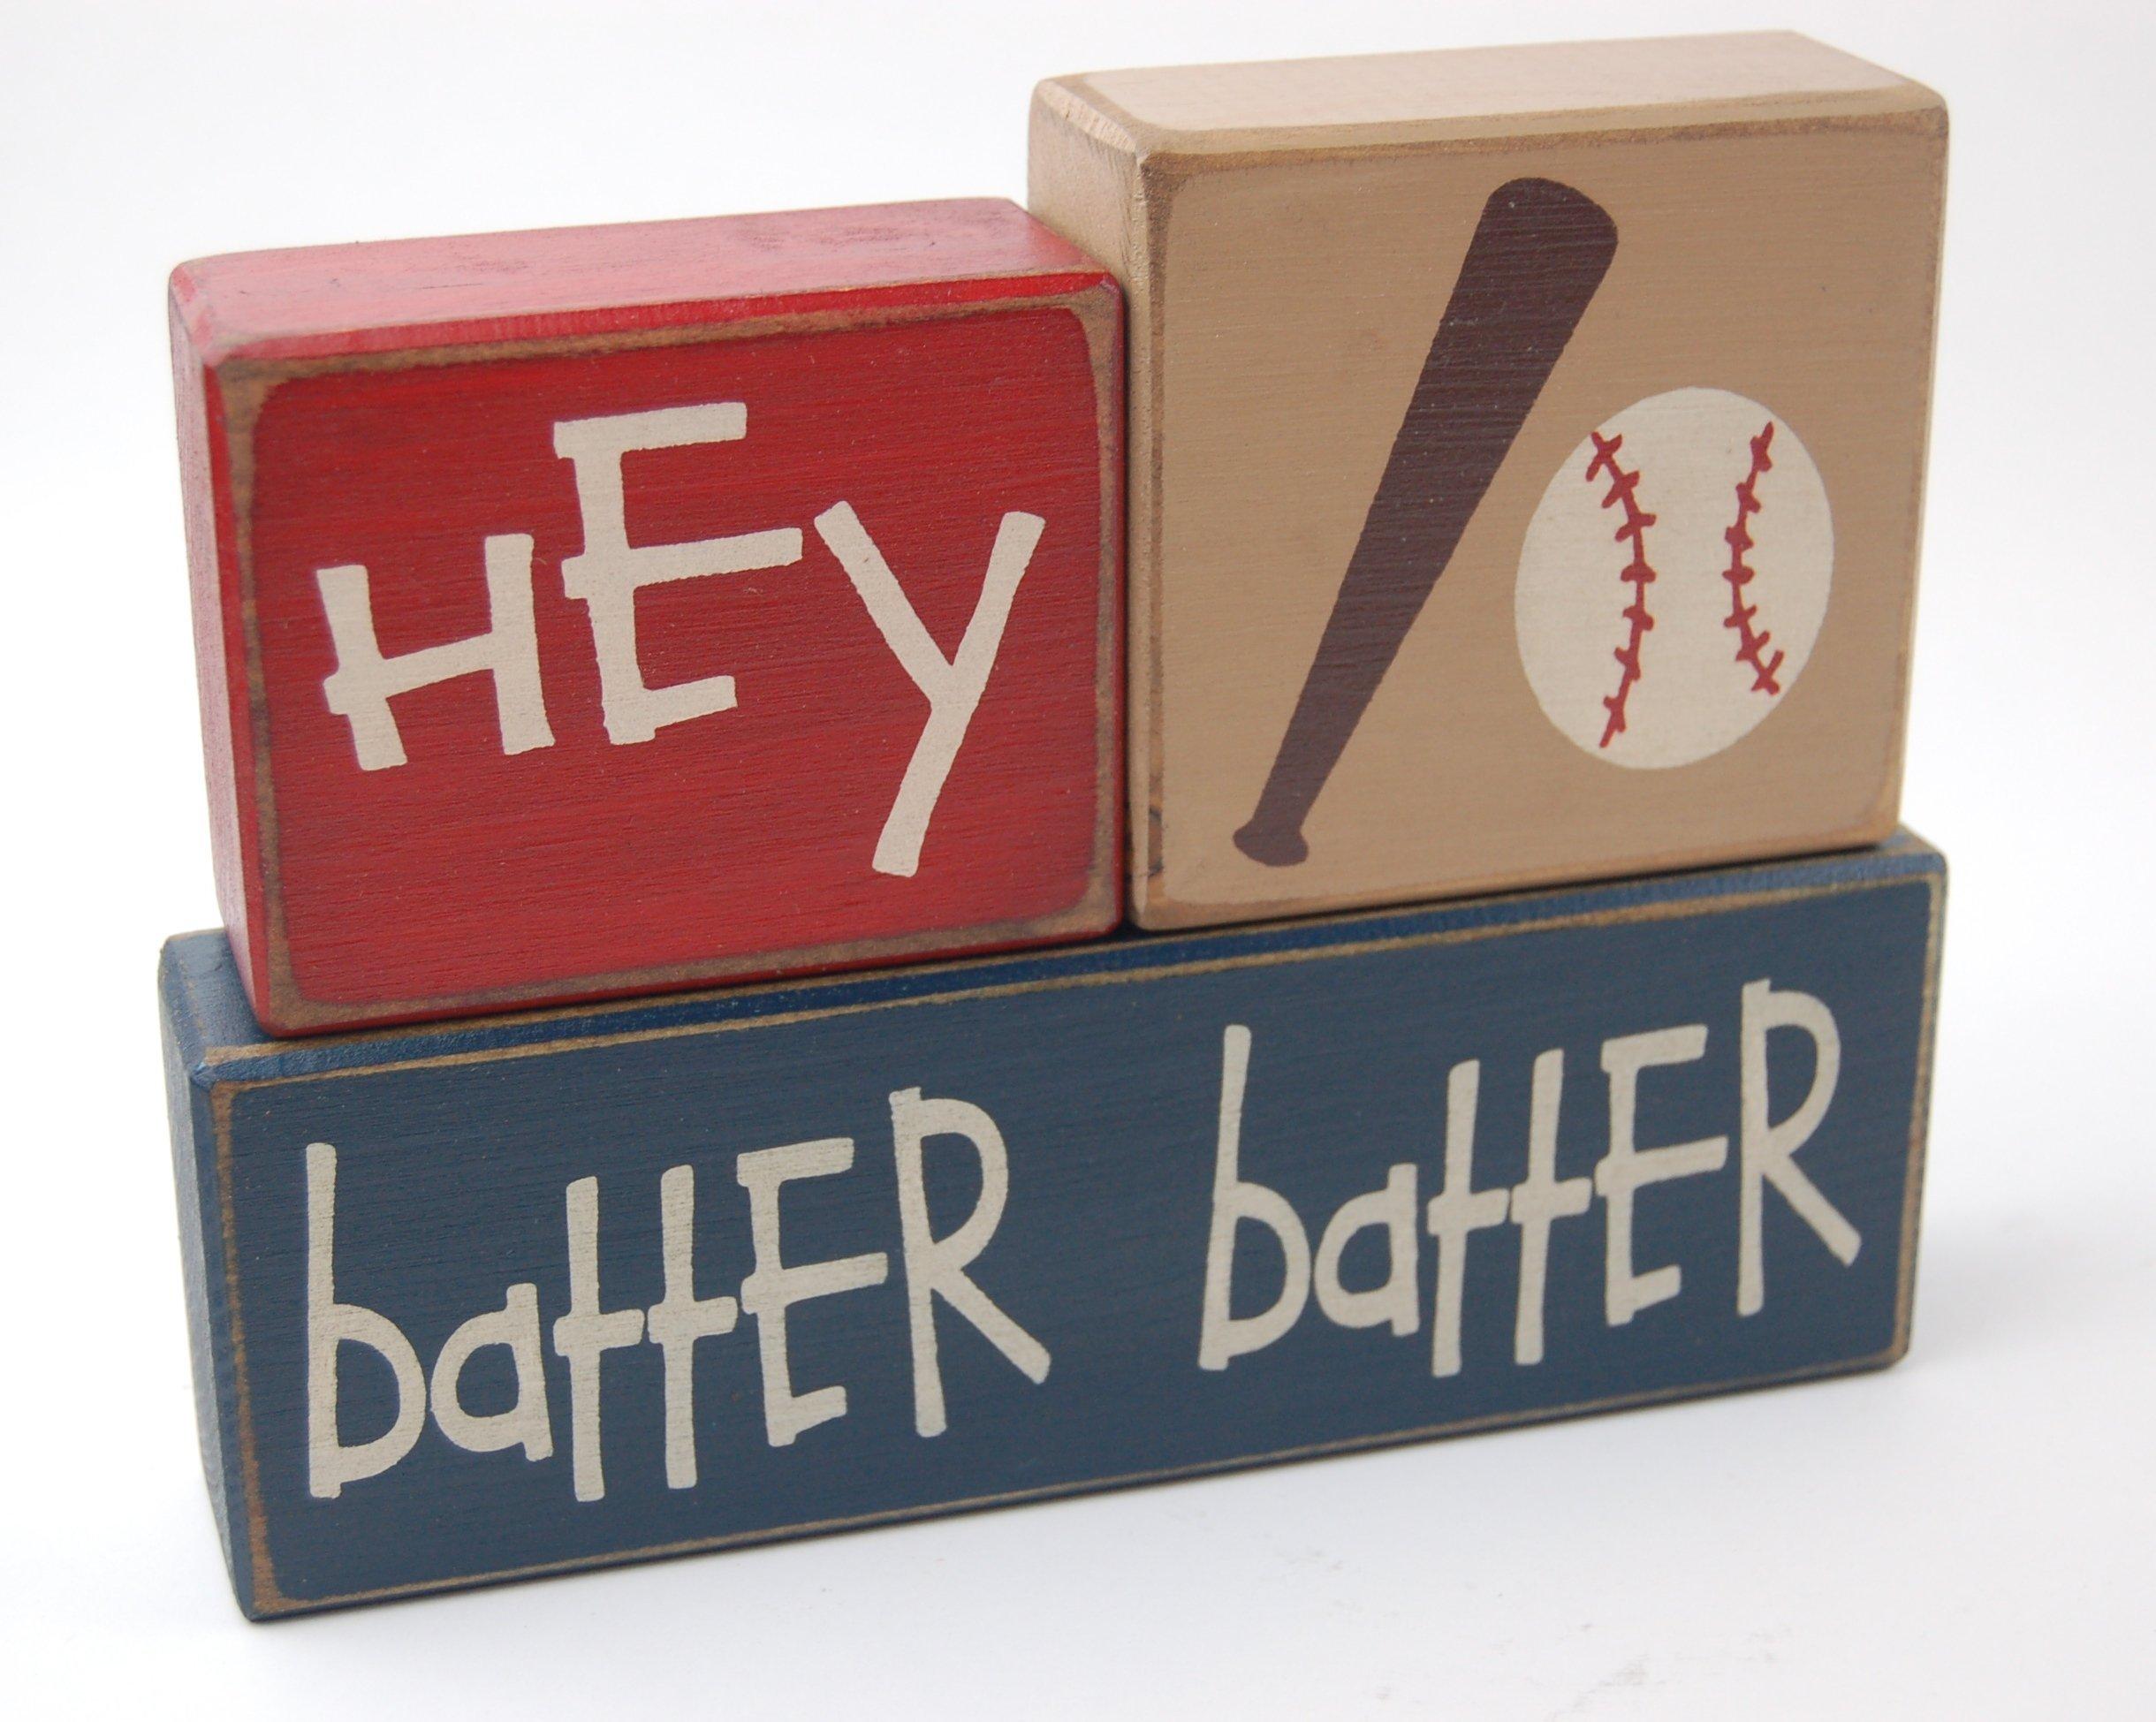 Hey Batter Batter - Primitive Country Wood Stacking Sign Blocks-Baseball Collection-Boys Sports-Nursery Room-Baseball Baby Shower-Baseball Birthday Sports Home Decor